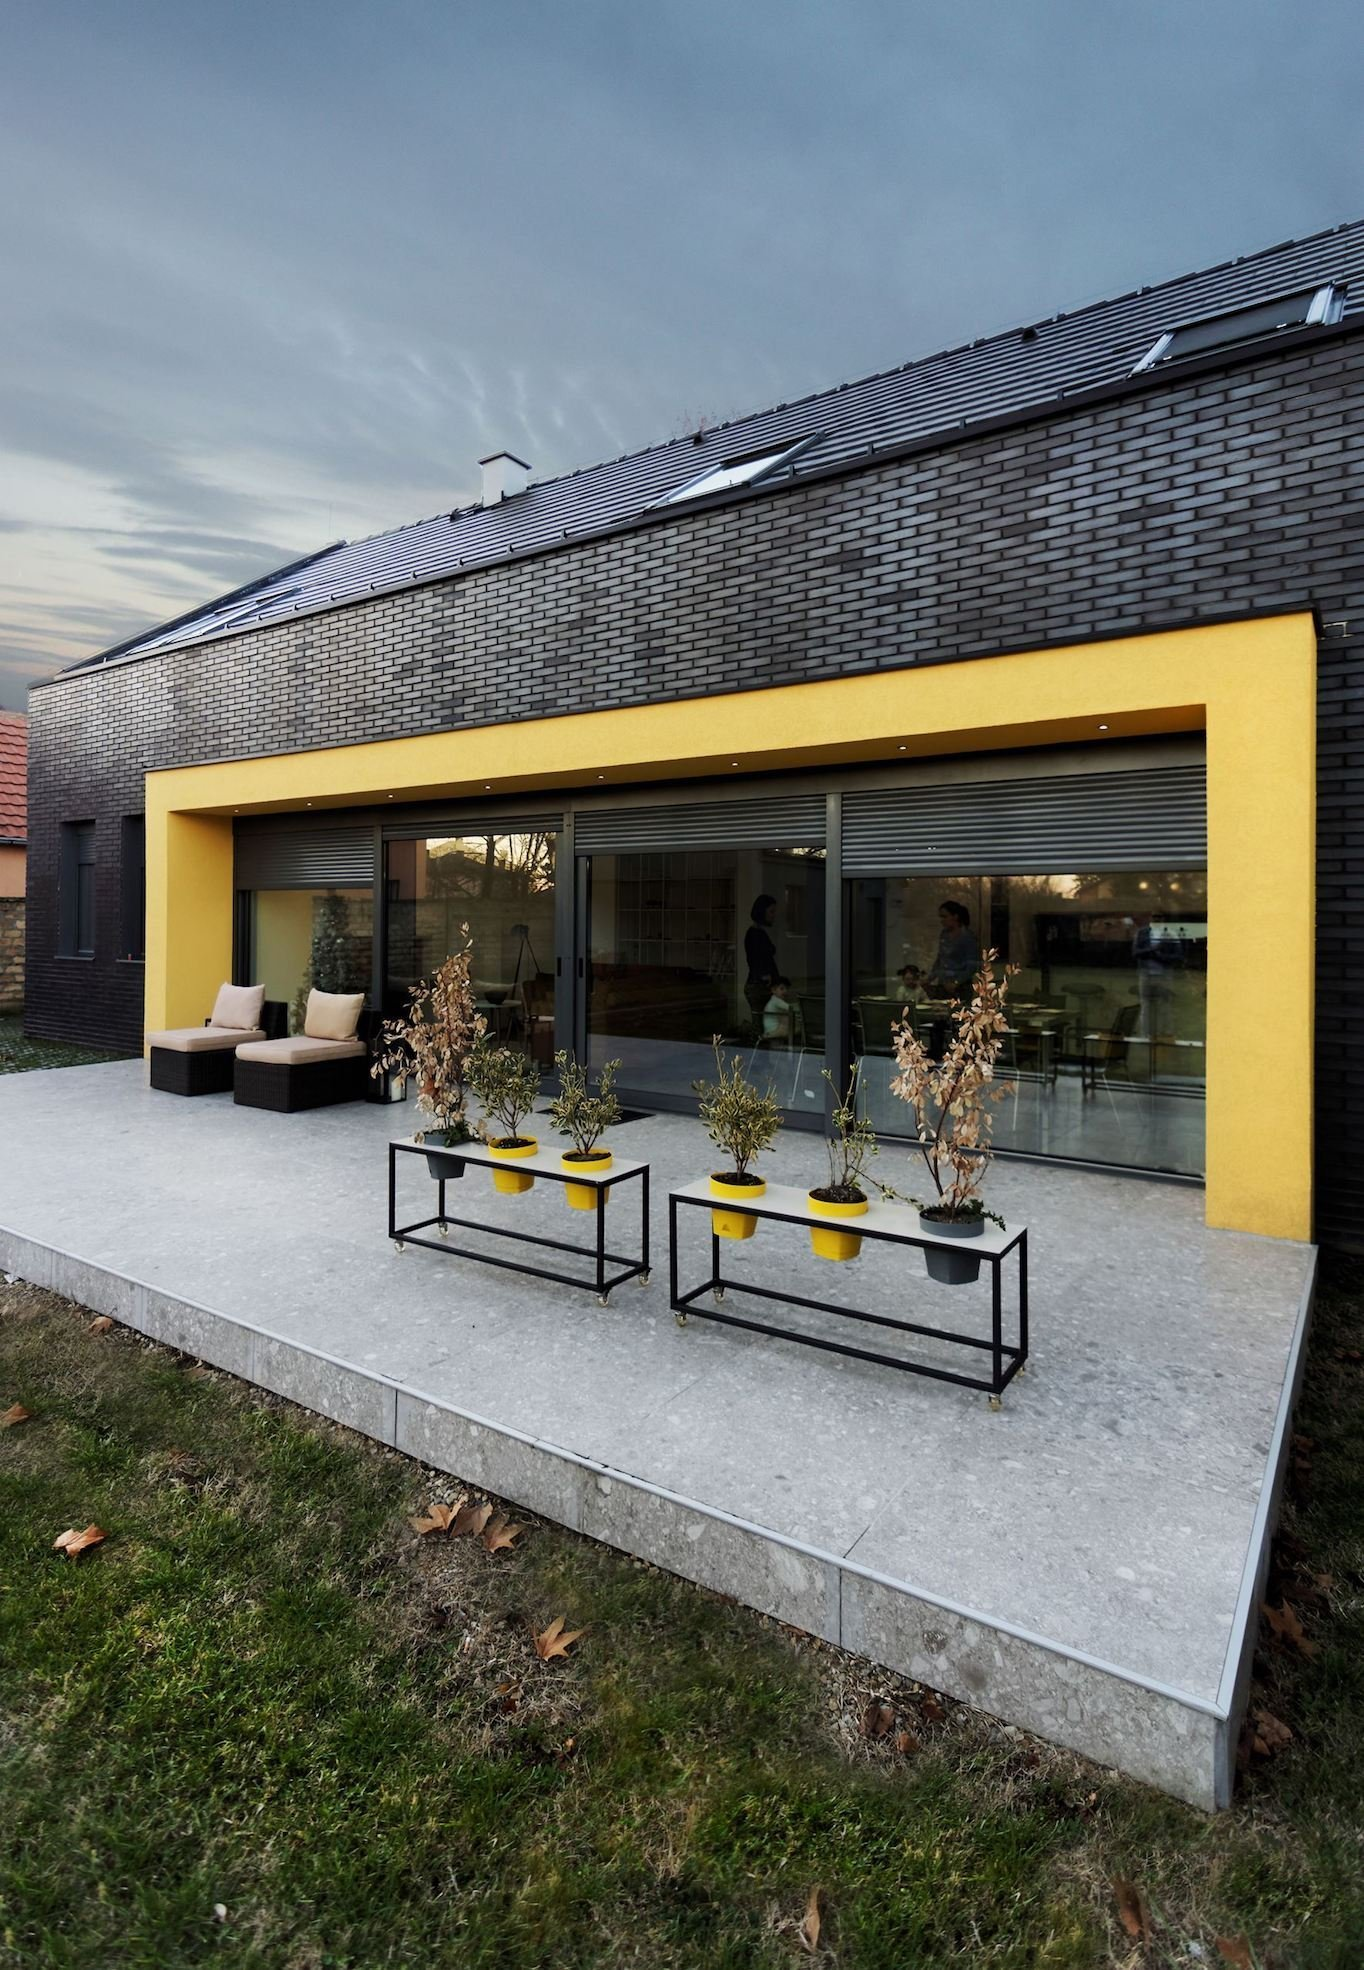 Prázdninový dům inspirovaný srbskou architekturou